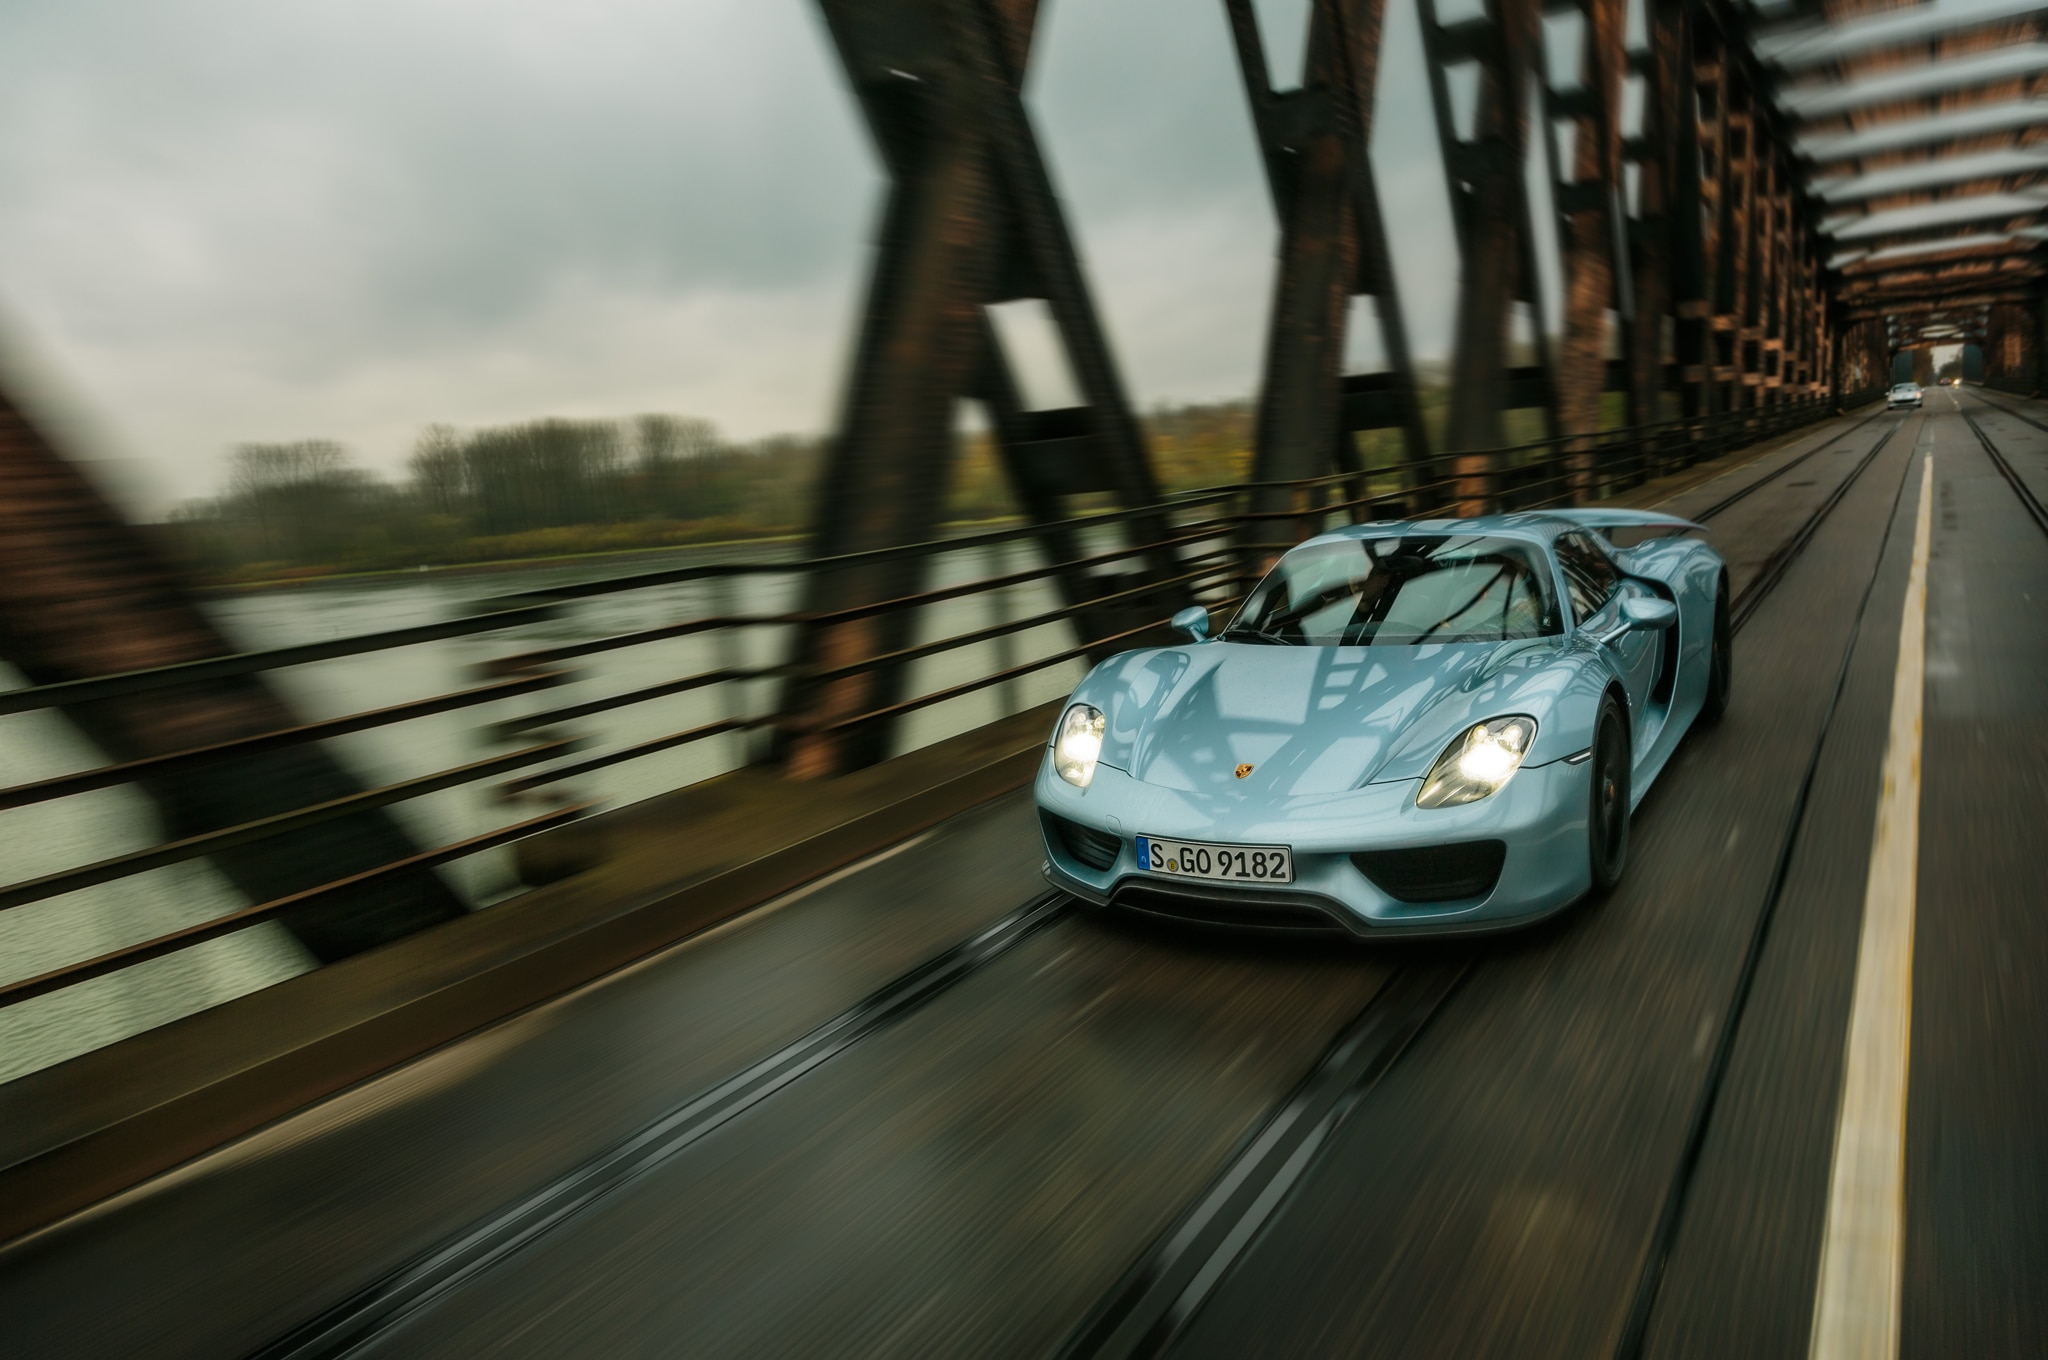 2014 Porsche 918 Spyder In Germany Front Three Quarter Over Bridge